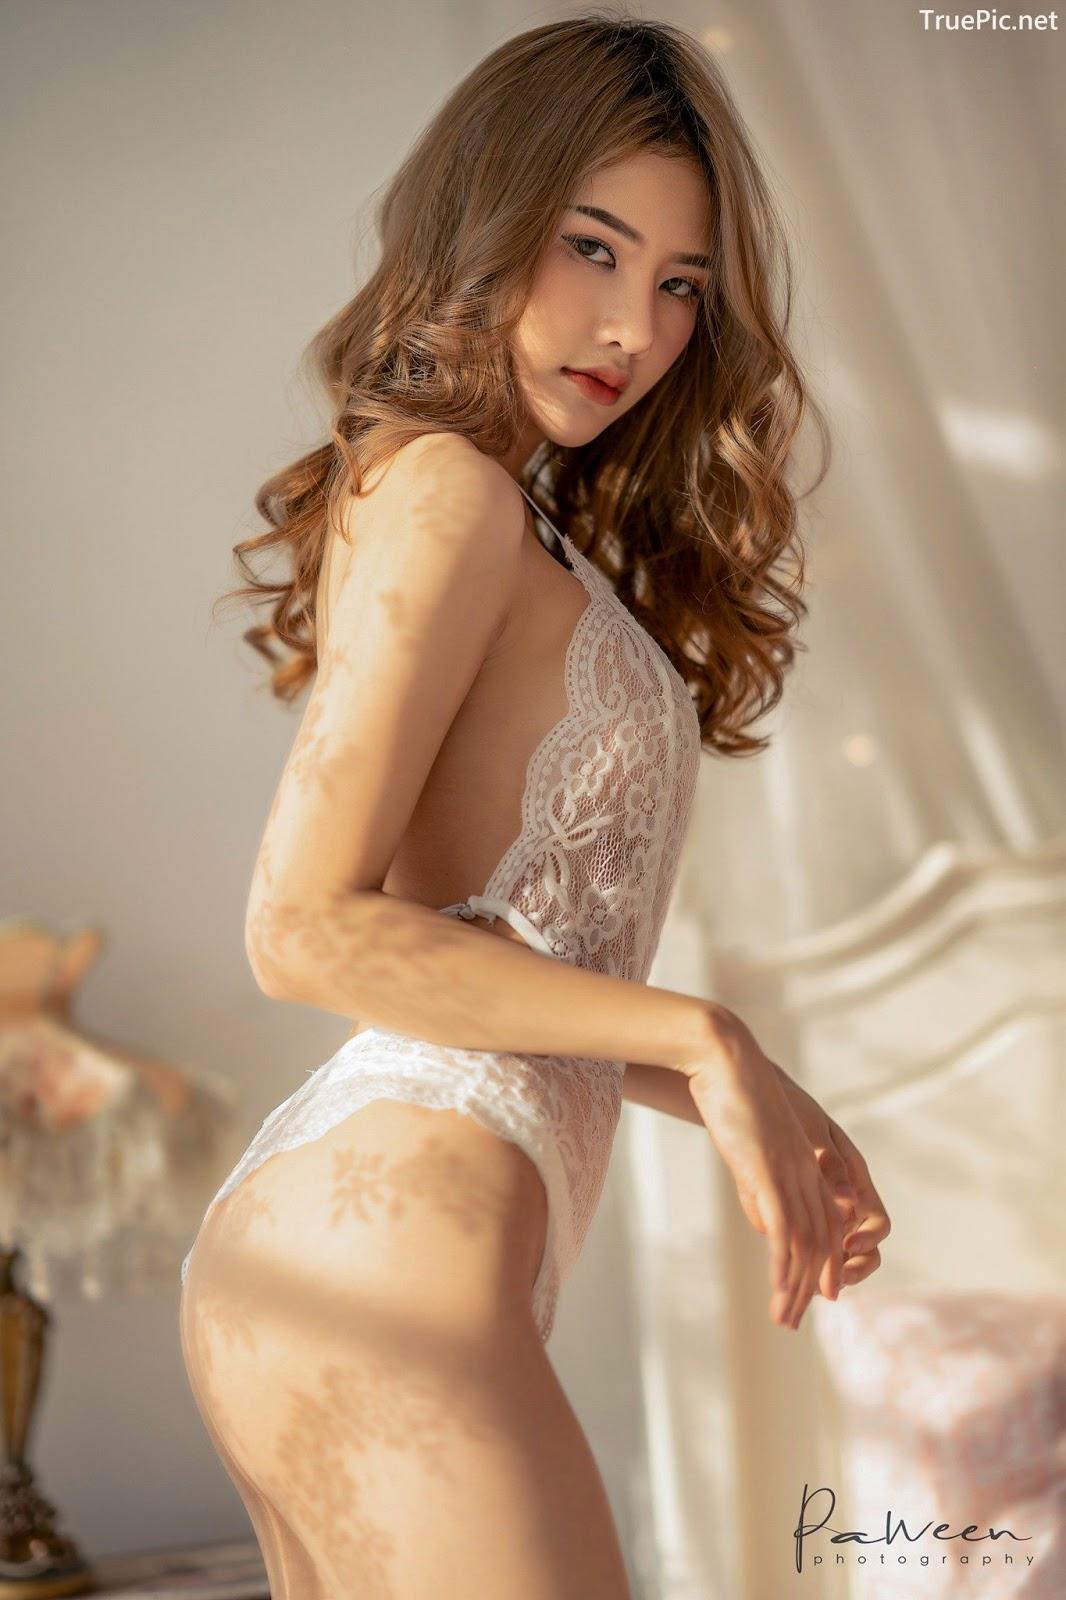 Image Thailand Model - Atittaya Chaiyasing - White Lace Lingerie - TruePic.net - Picture-9